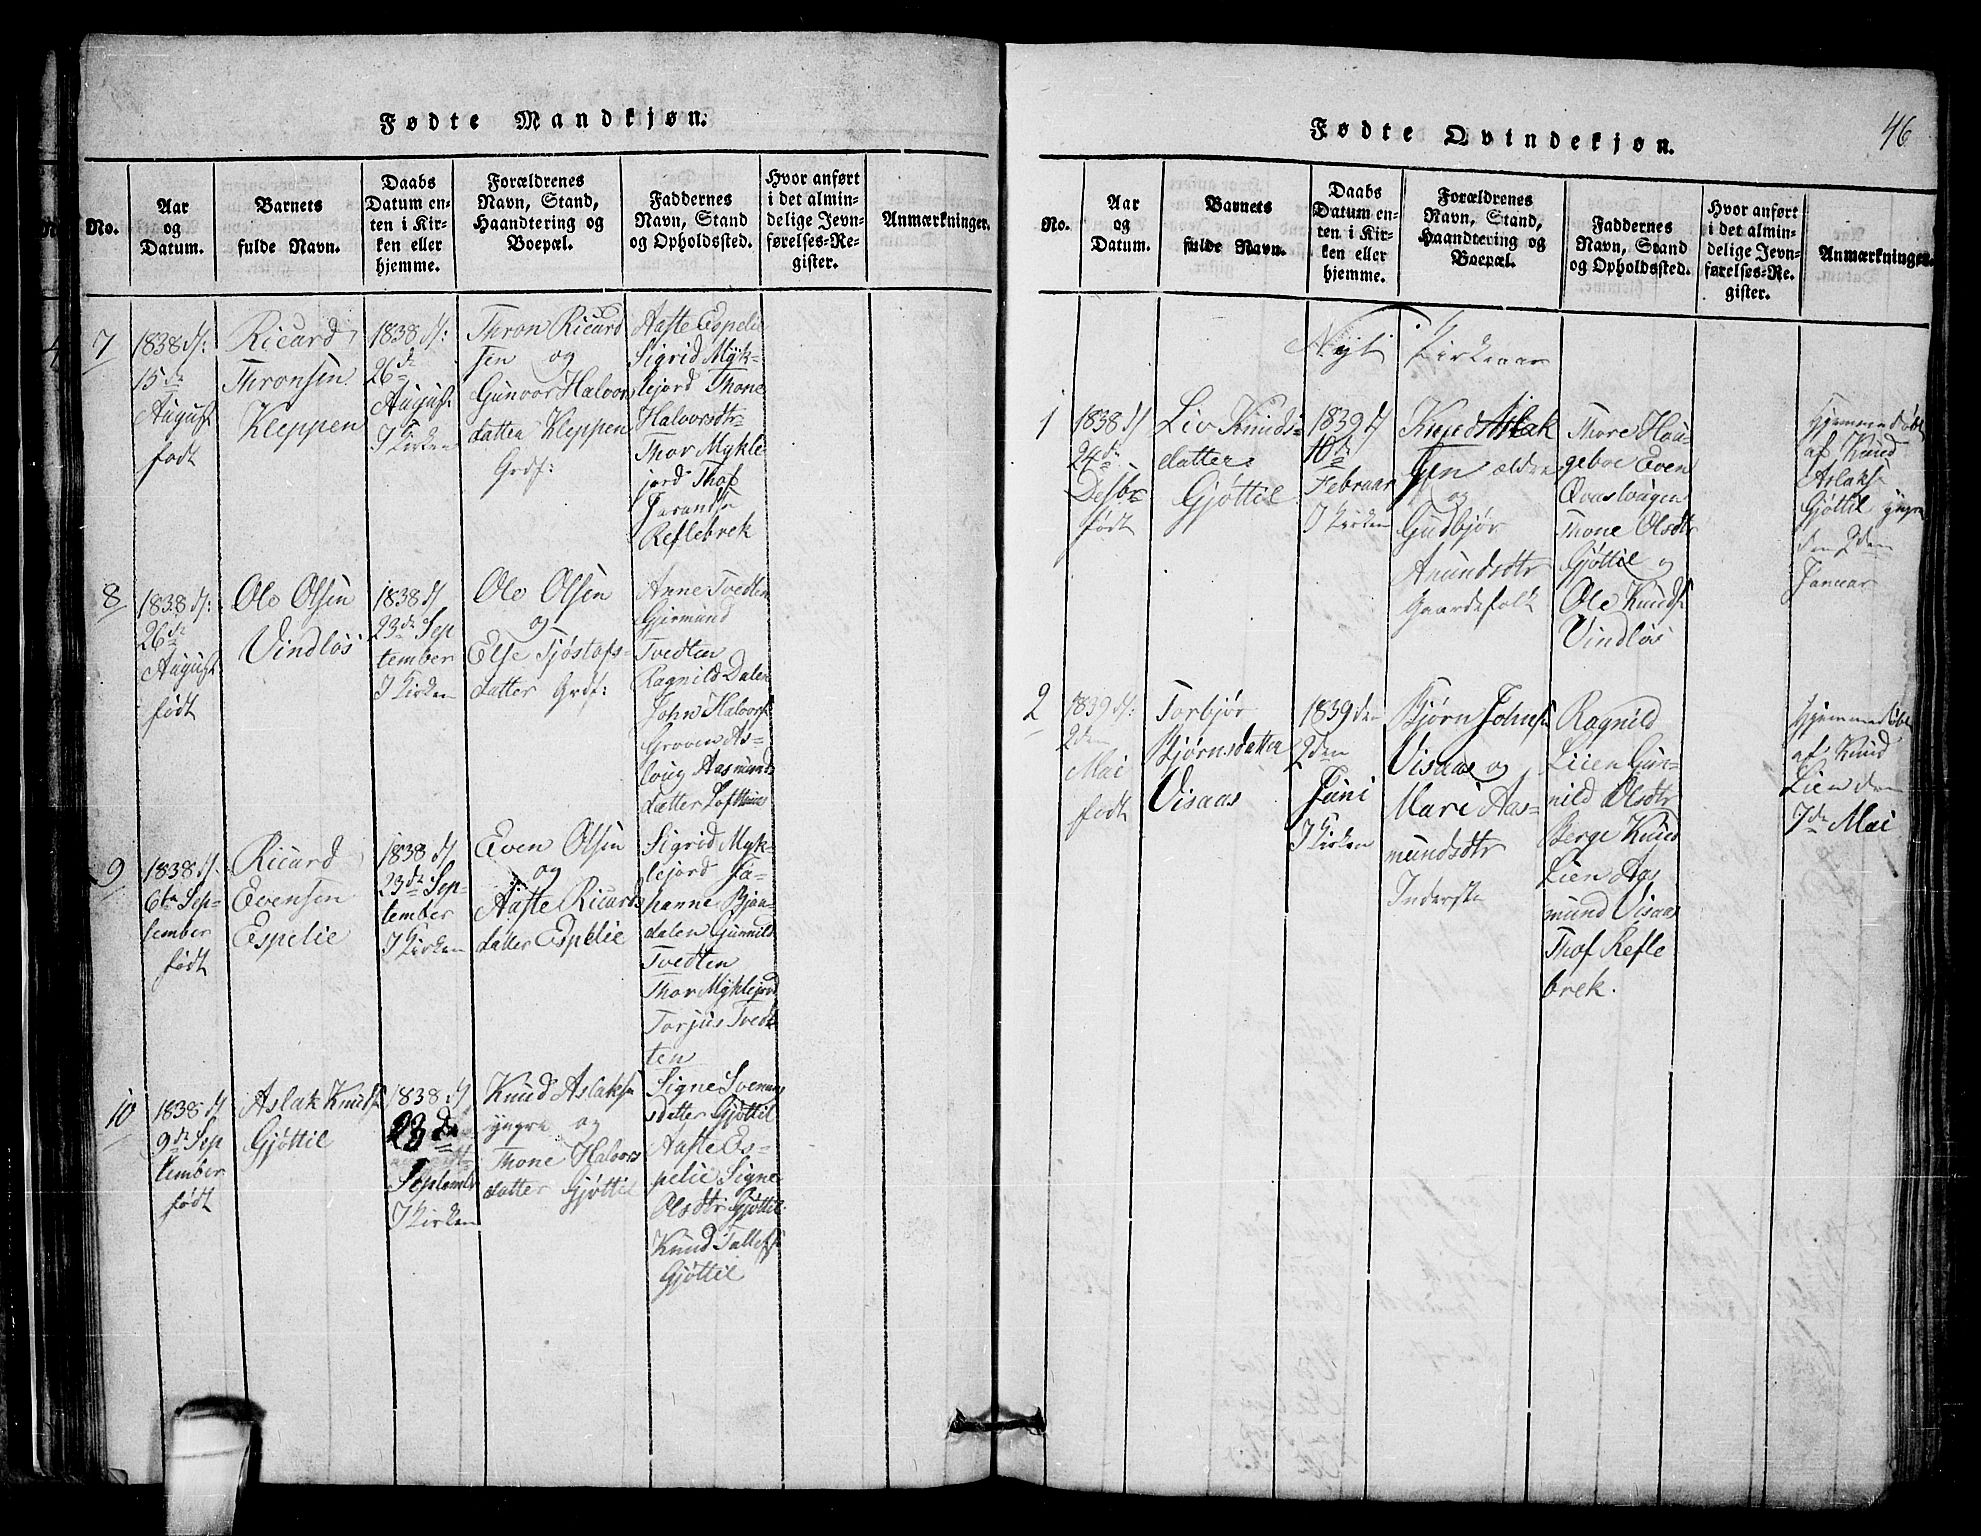 SAKO, Lårdal kirkebøker, G/Gb/L0001: Klokkerbok nr. II 1, 1815-1865, s. 46